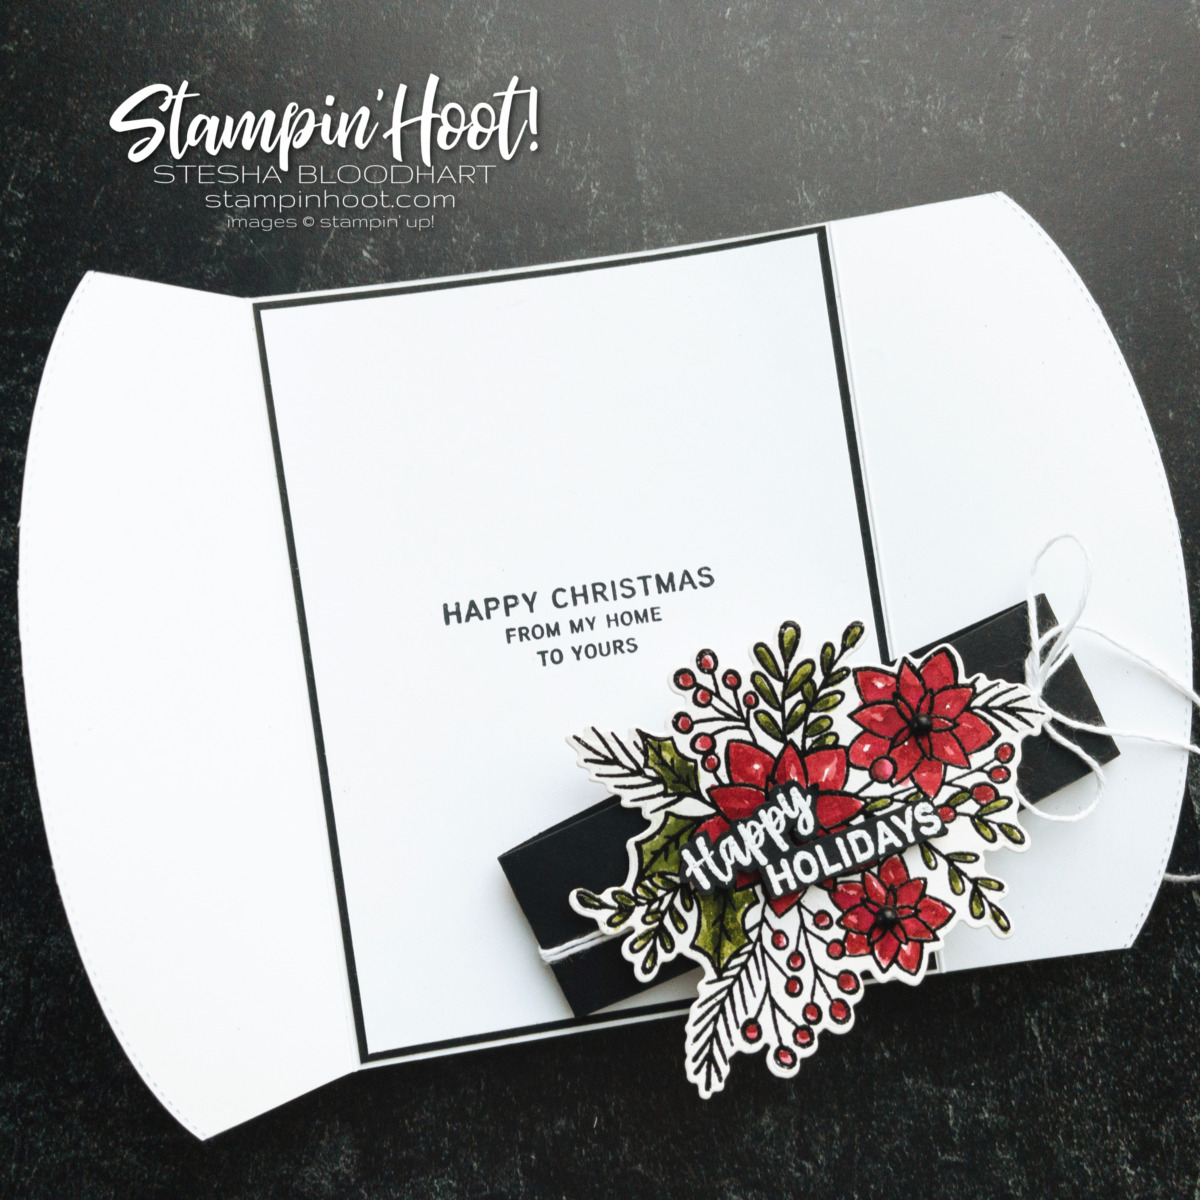 Words of Cheer Bundle from Stampin' Up! Fun Gatefold card using Basic Borders Dies by Stesha Bloodhart, Stampin' Hoot!